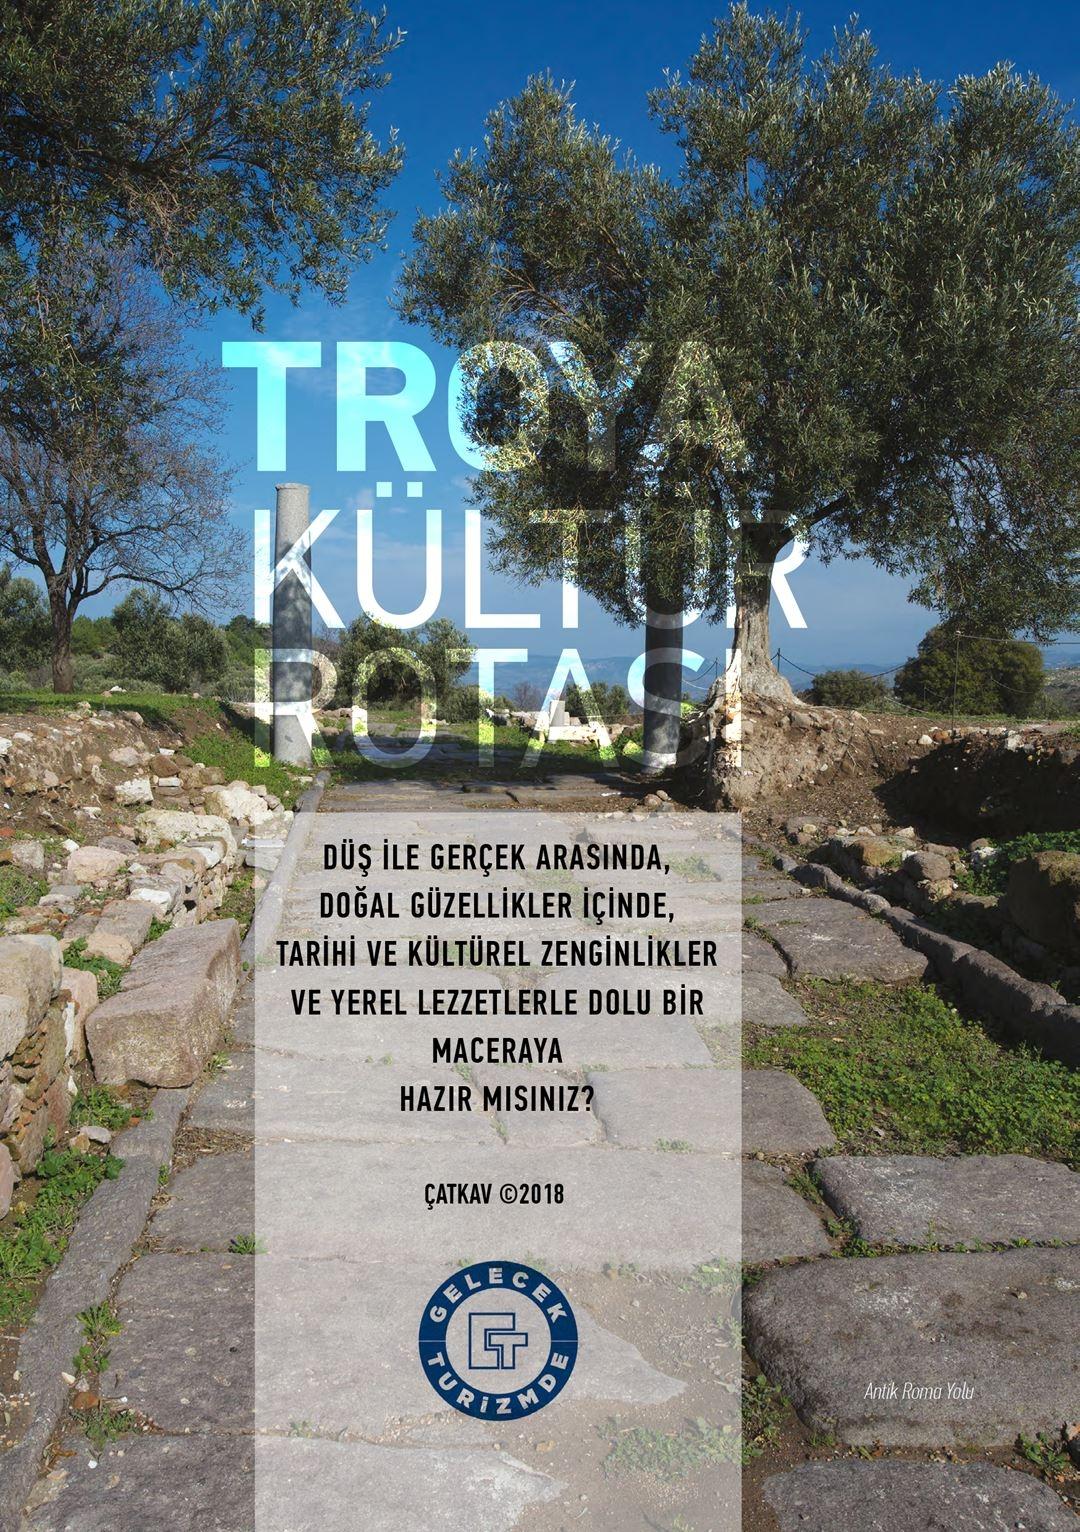 Troya Kültür Rotası